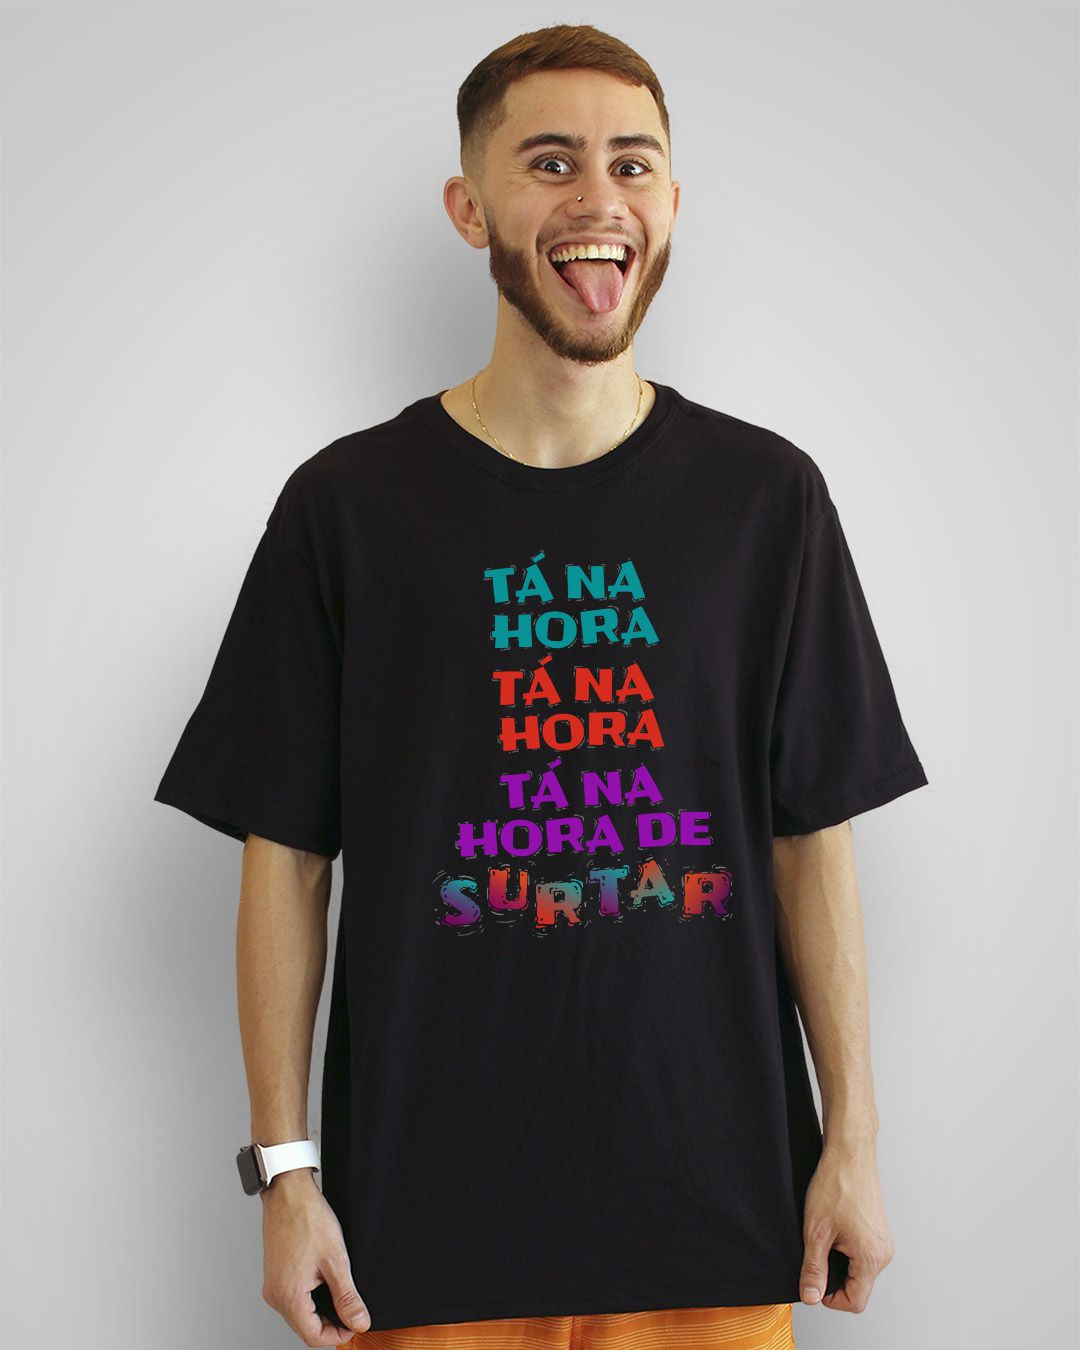 Camiseta Tá na hora, tá na hora, tá na hora de surtar